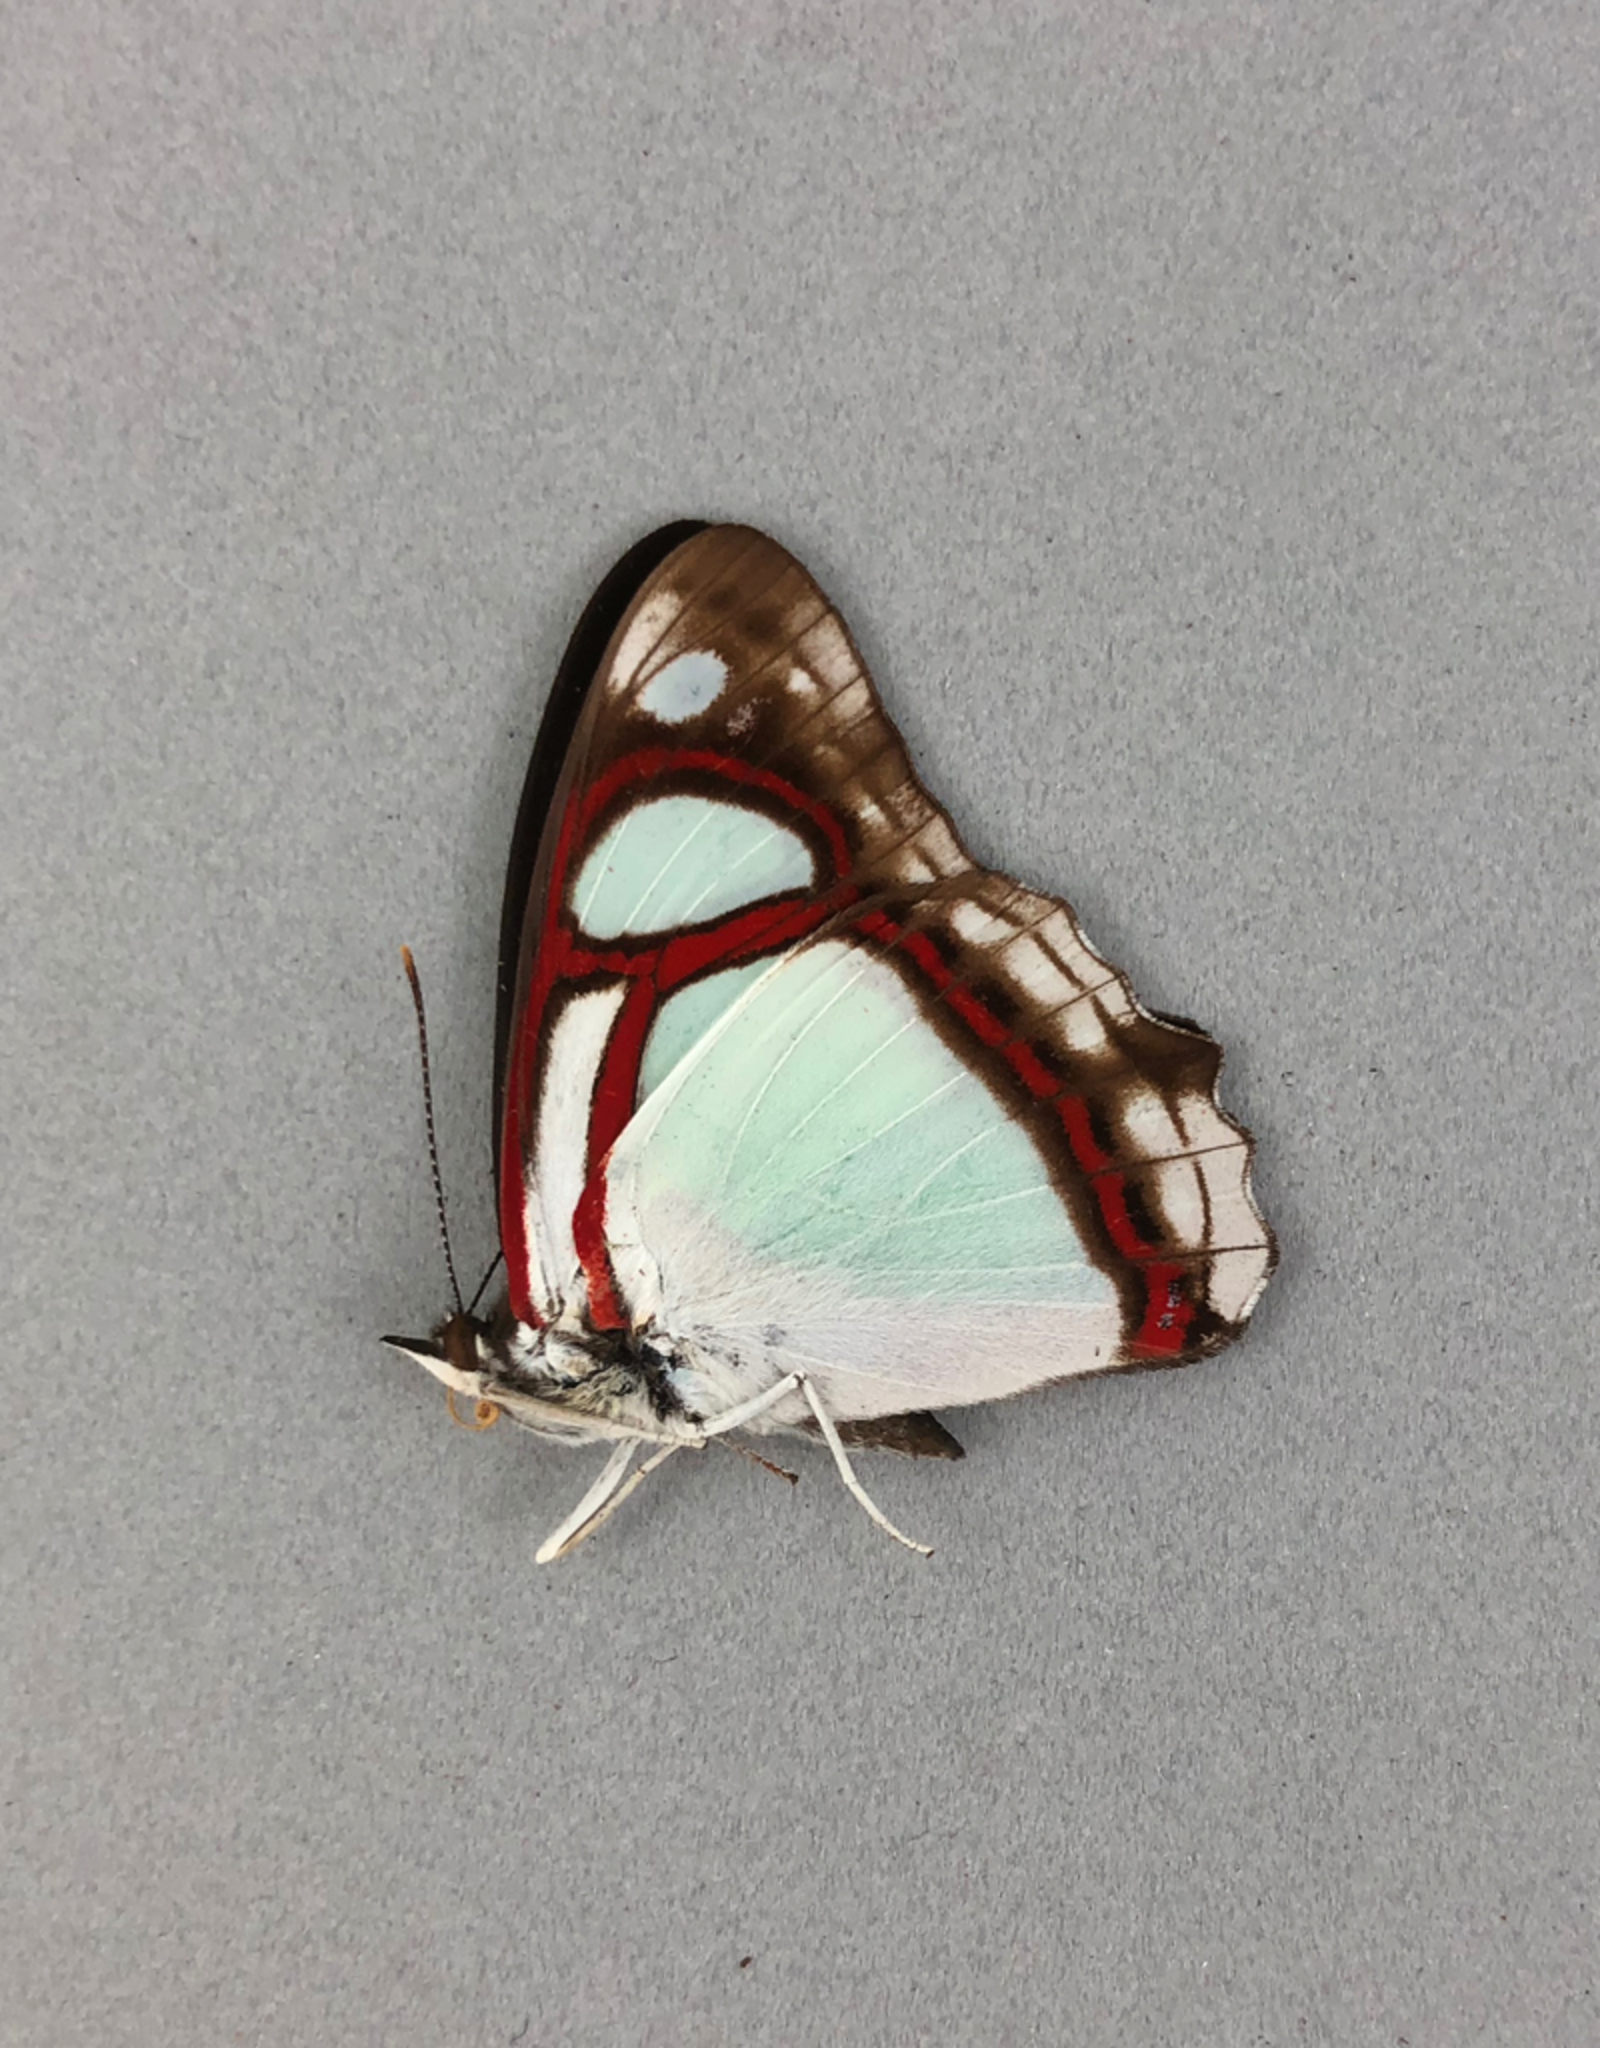 Pyrrhogyra edocla lysanias M A1 Peru